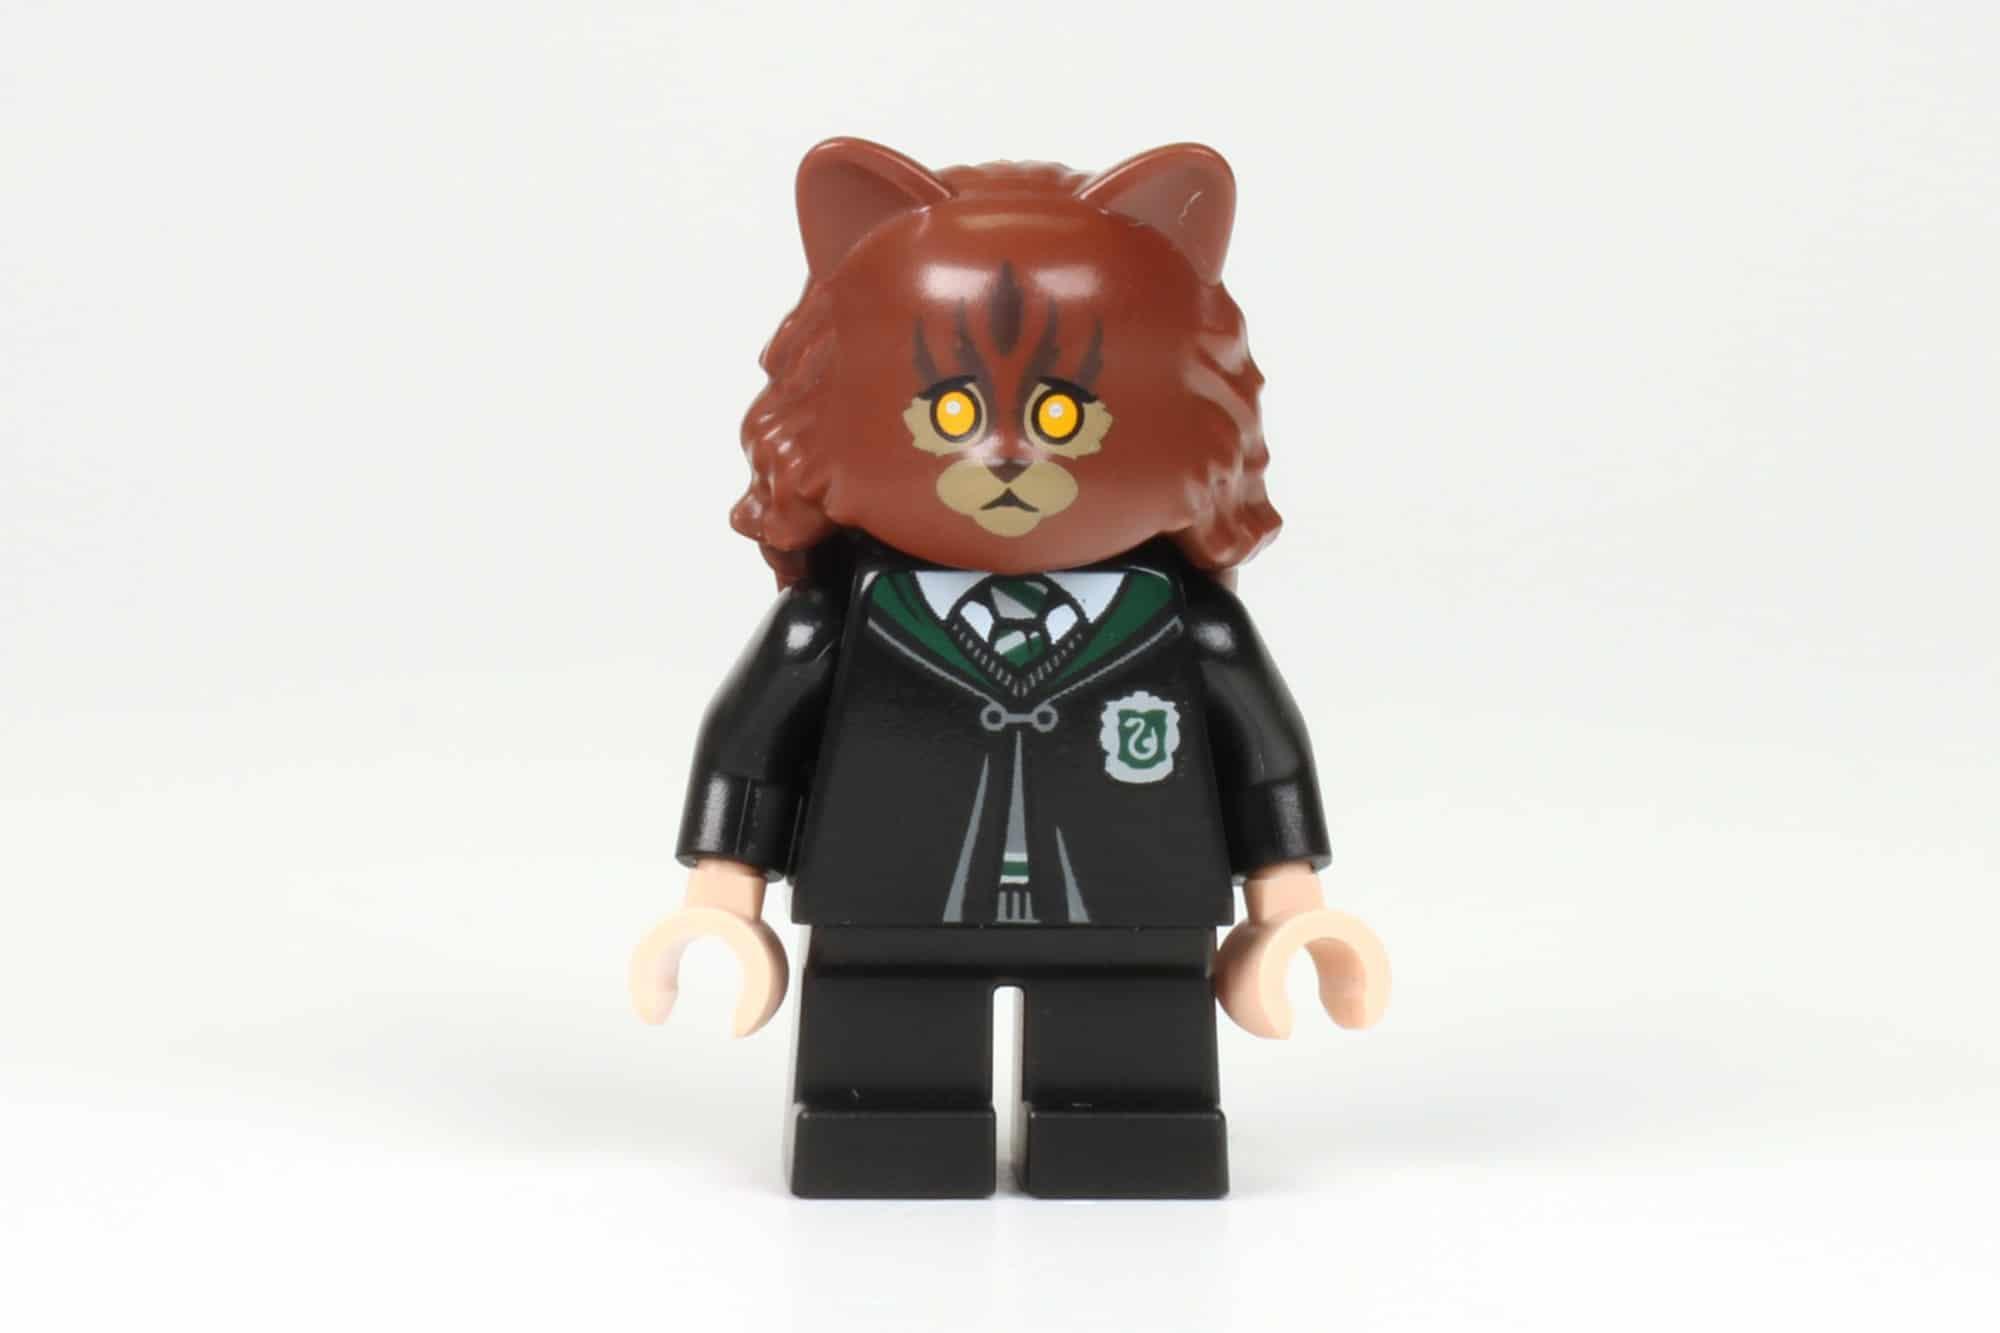 LEGO Harry Potter 76386 Hogwarts Misslungener Vielsafttrank Minifiguren 1 3